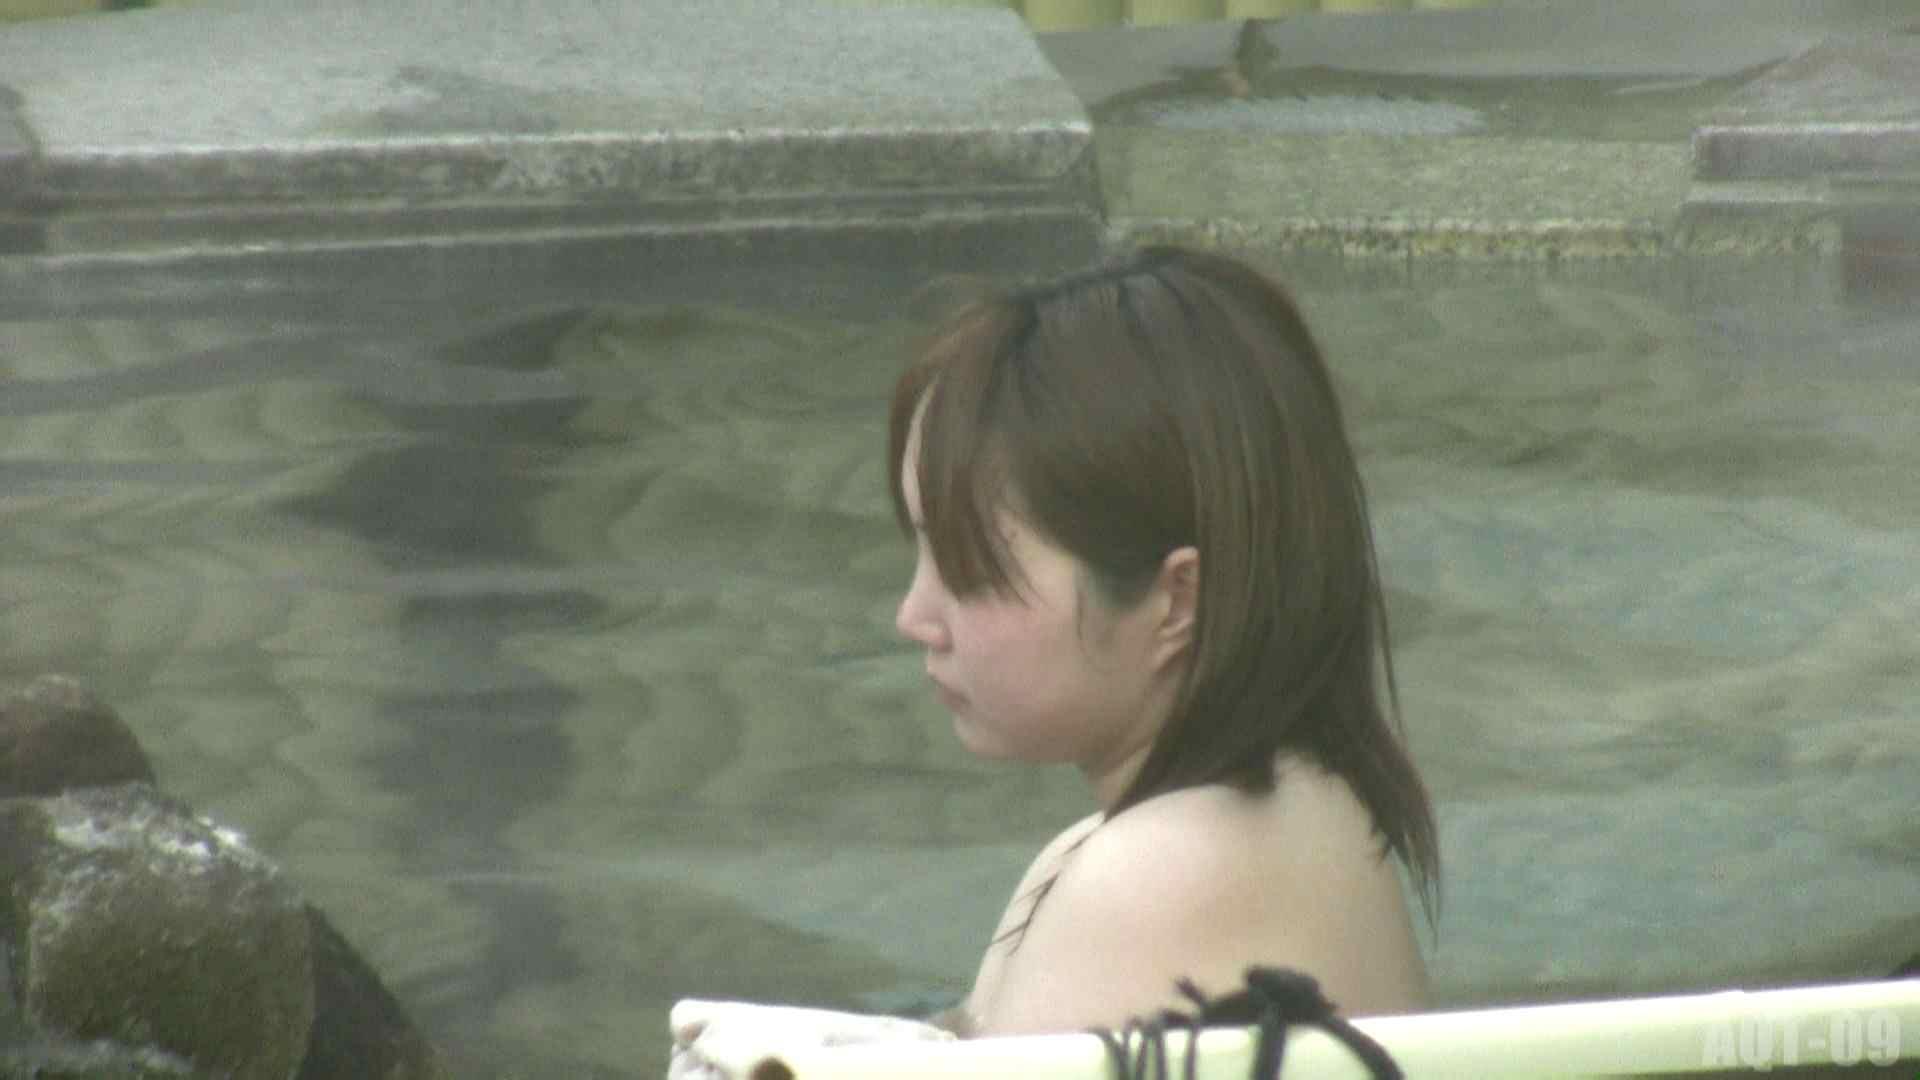 Aquaな露天風呂Vol.781 OLセックス 盗撮動画紹介 110画像 38